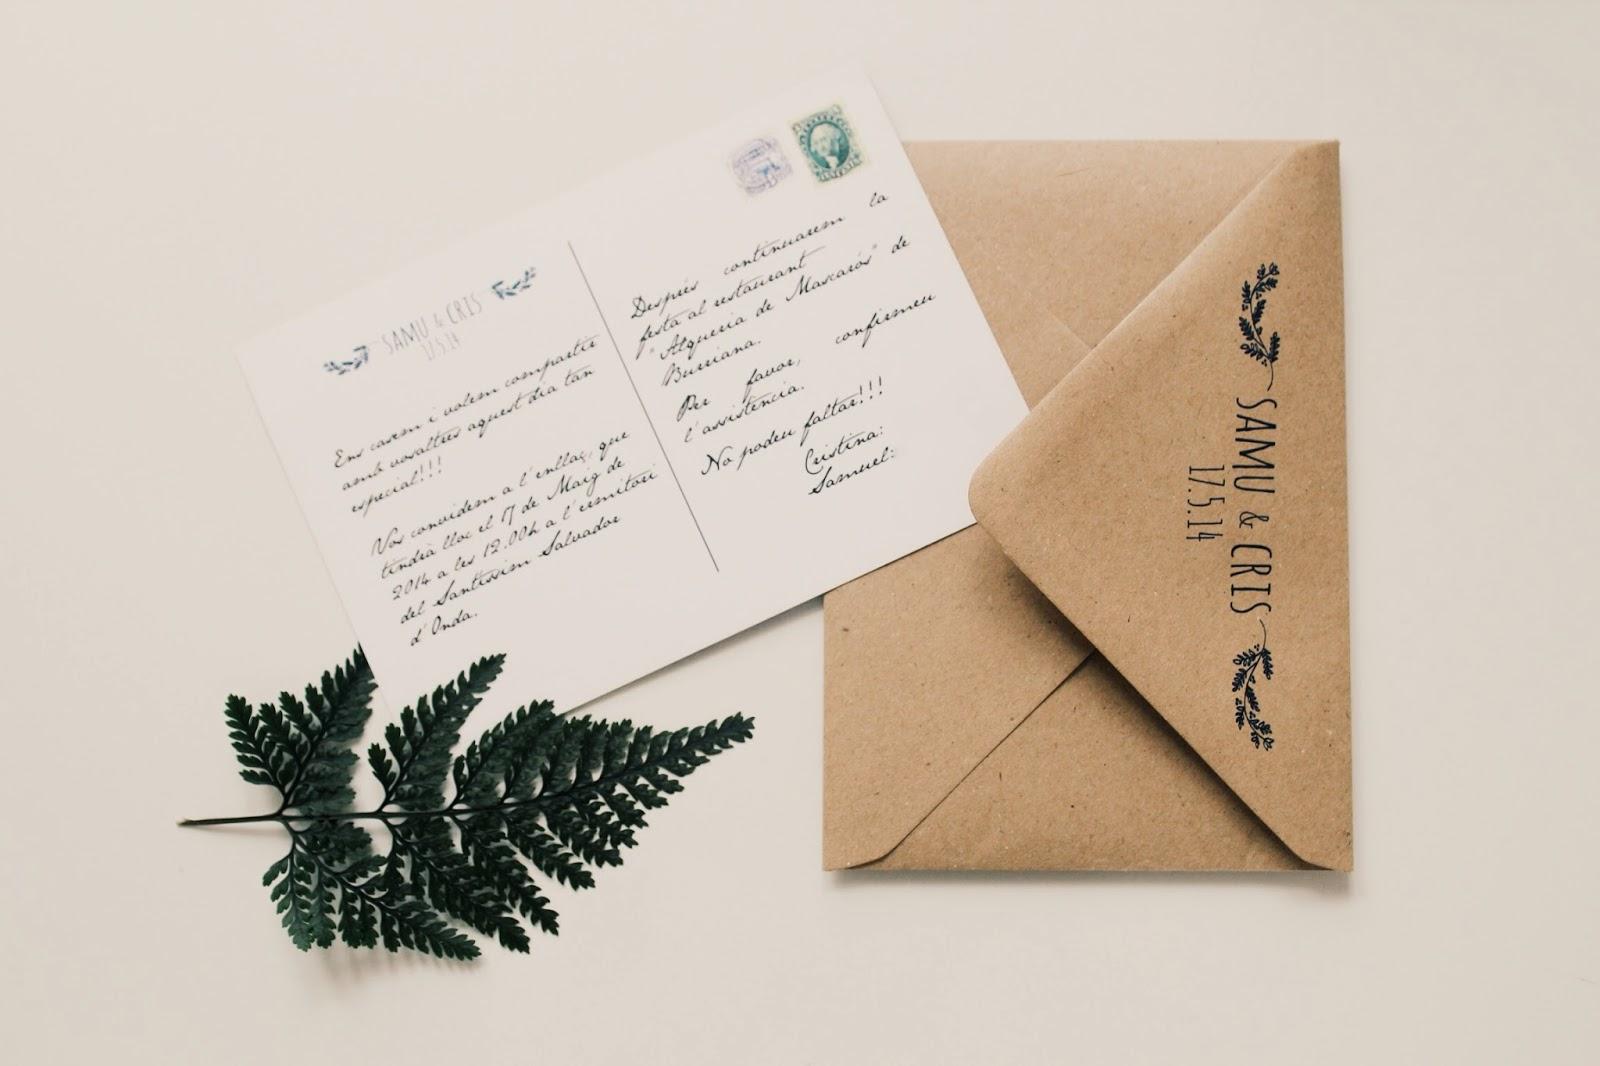 Invitaciones de boda Costo